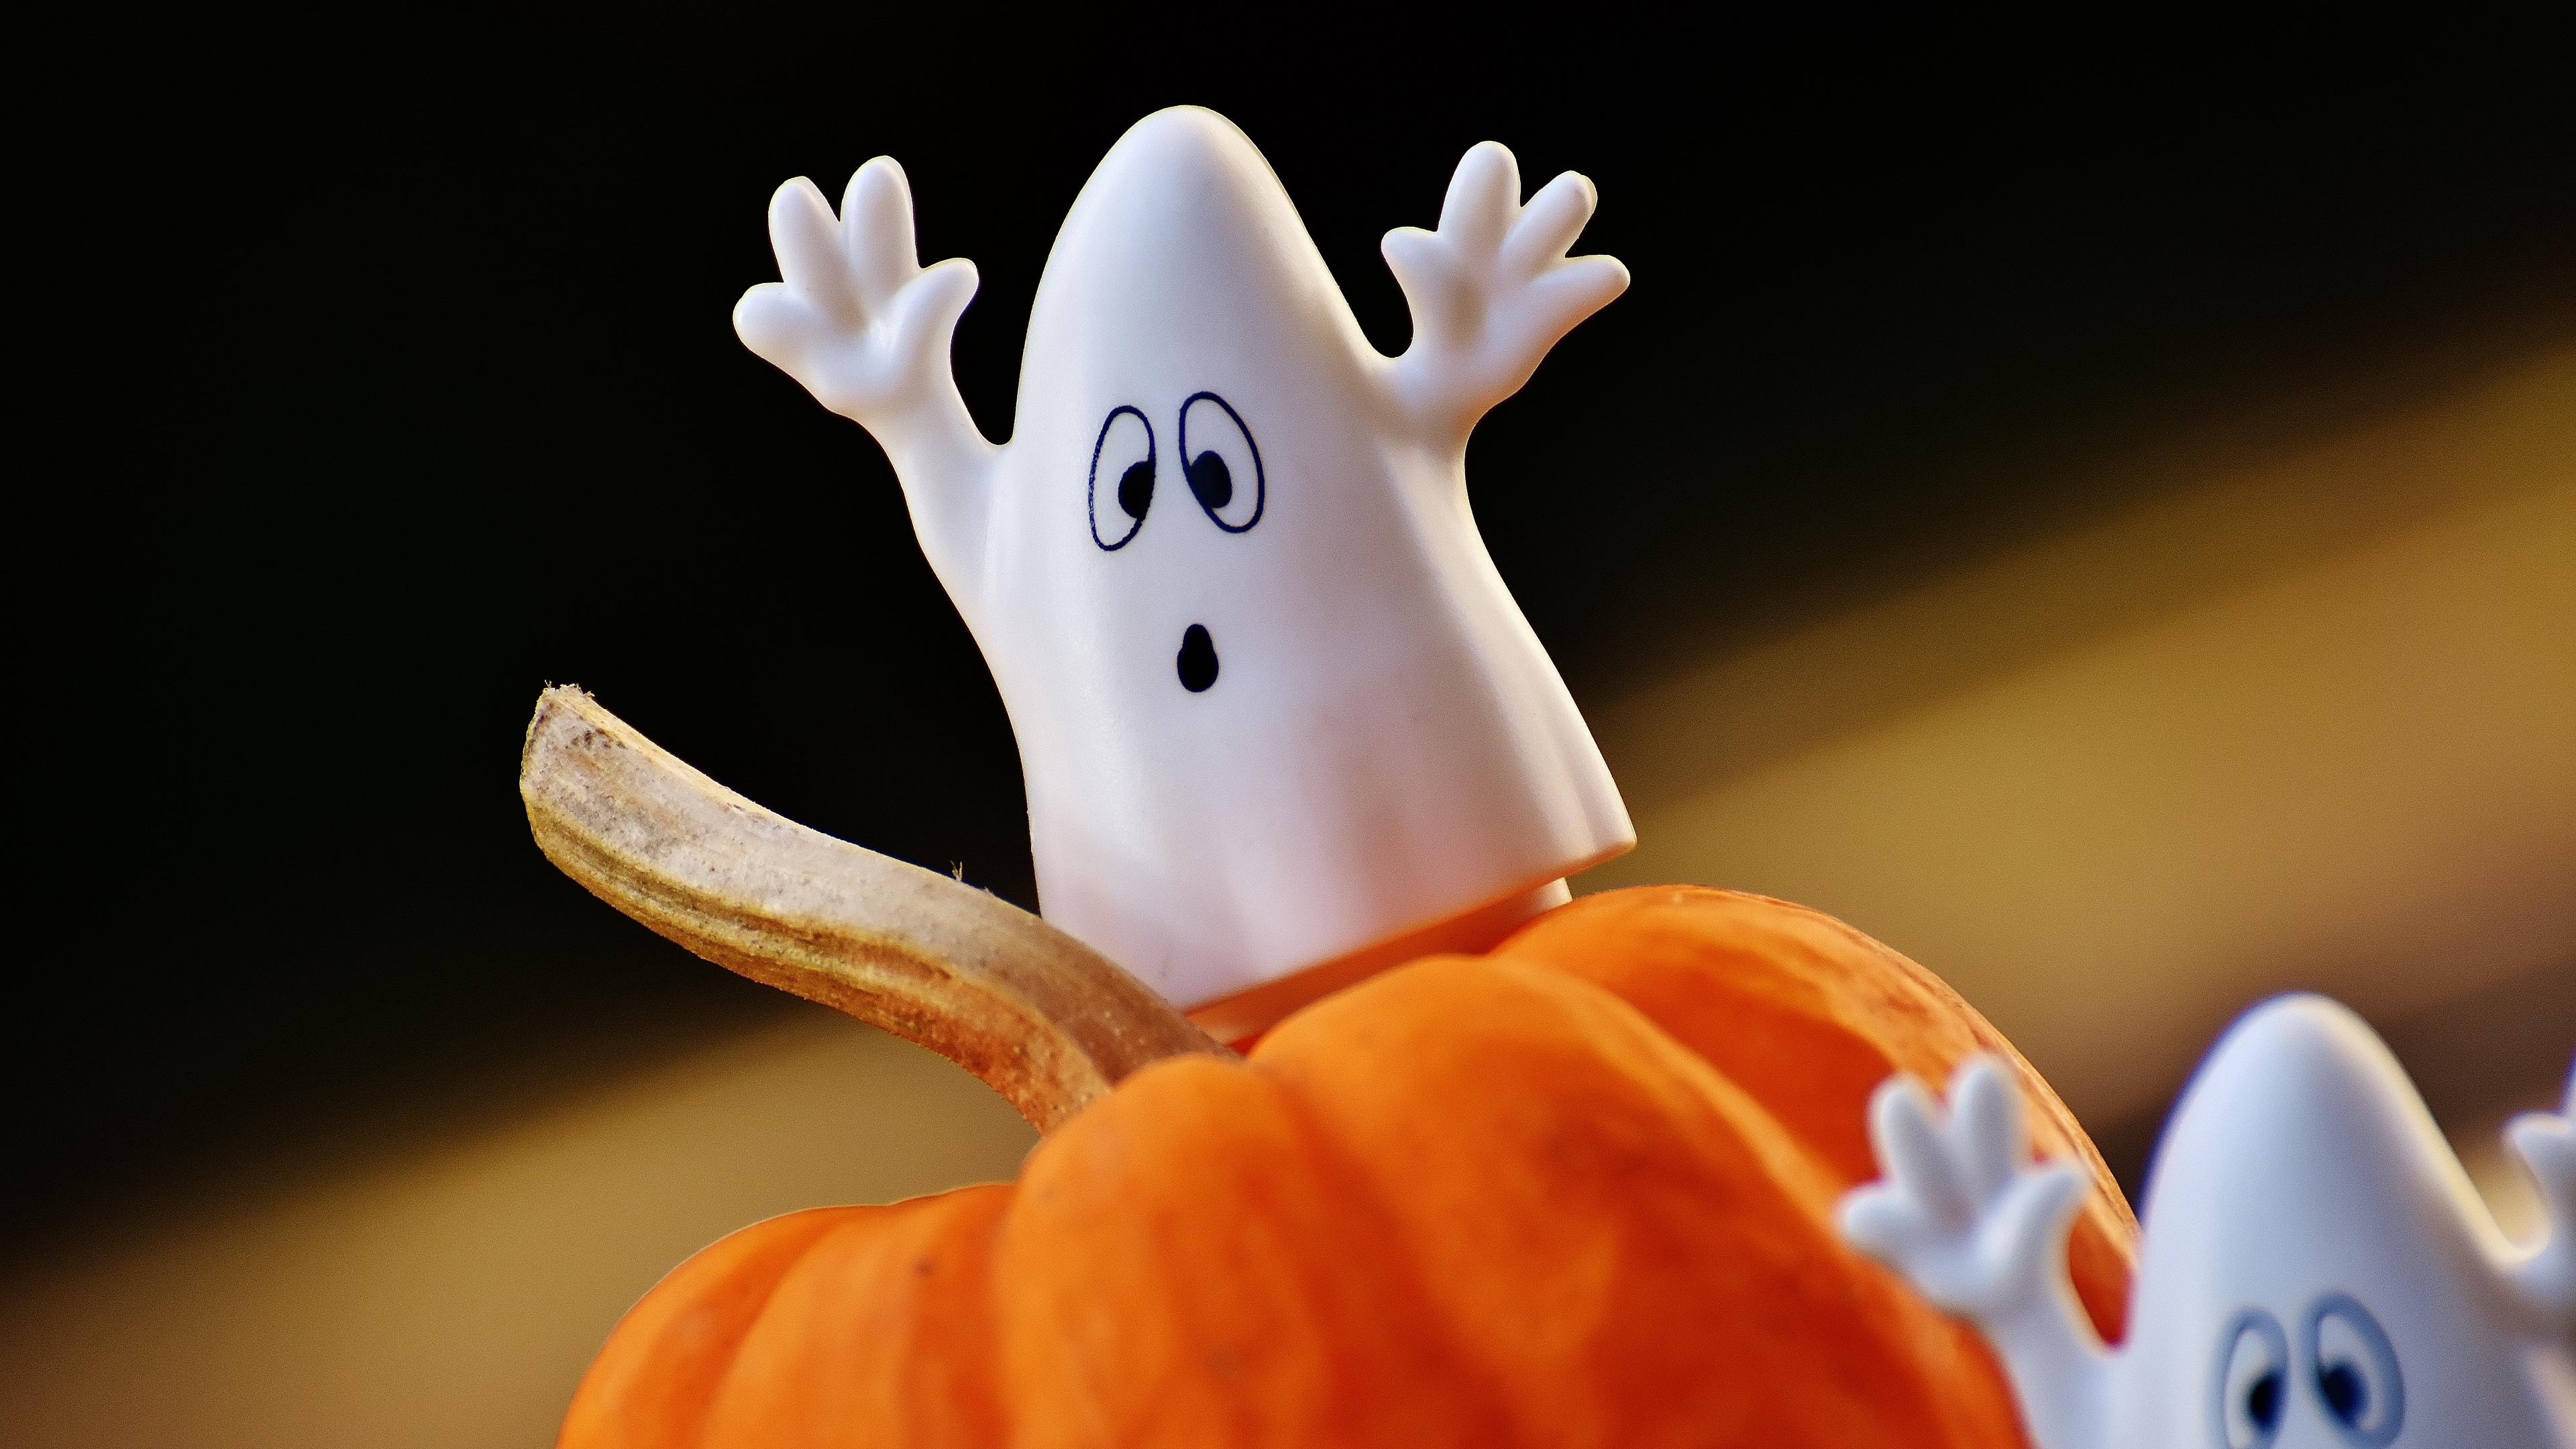 halloween pumpkins ghosts toys 4k 1538344964 - halloween, pumpkins, ghosts, toys 4k - pumpkins, halloween, Ghosts